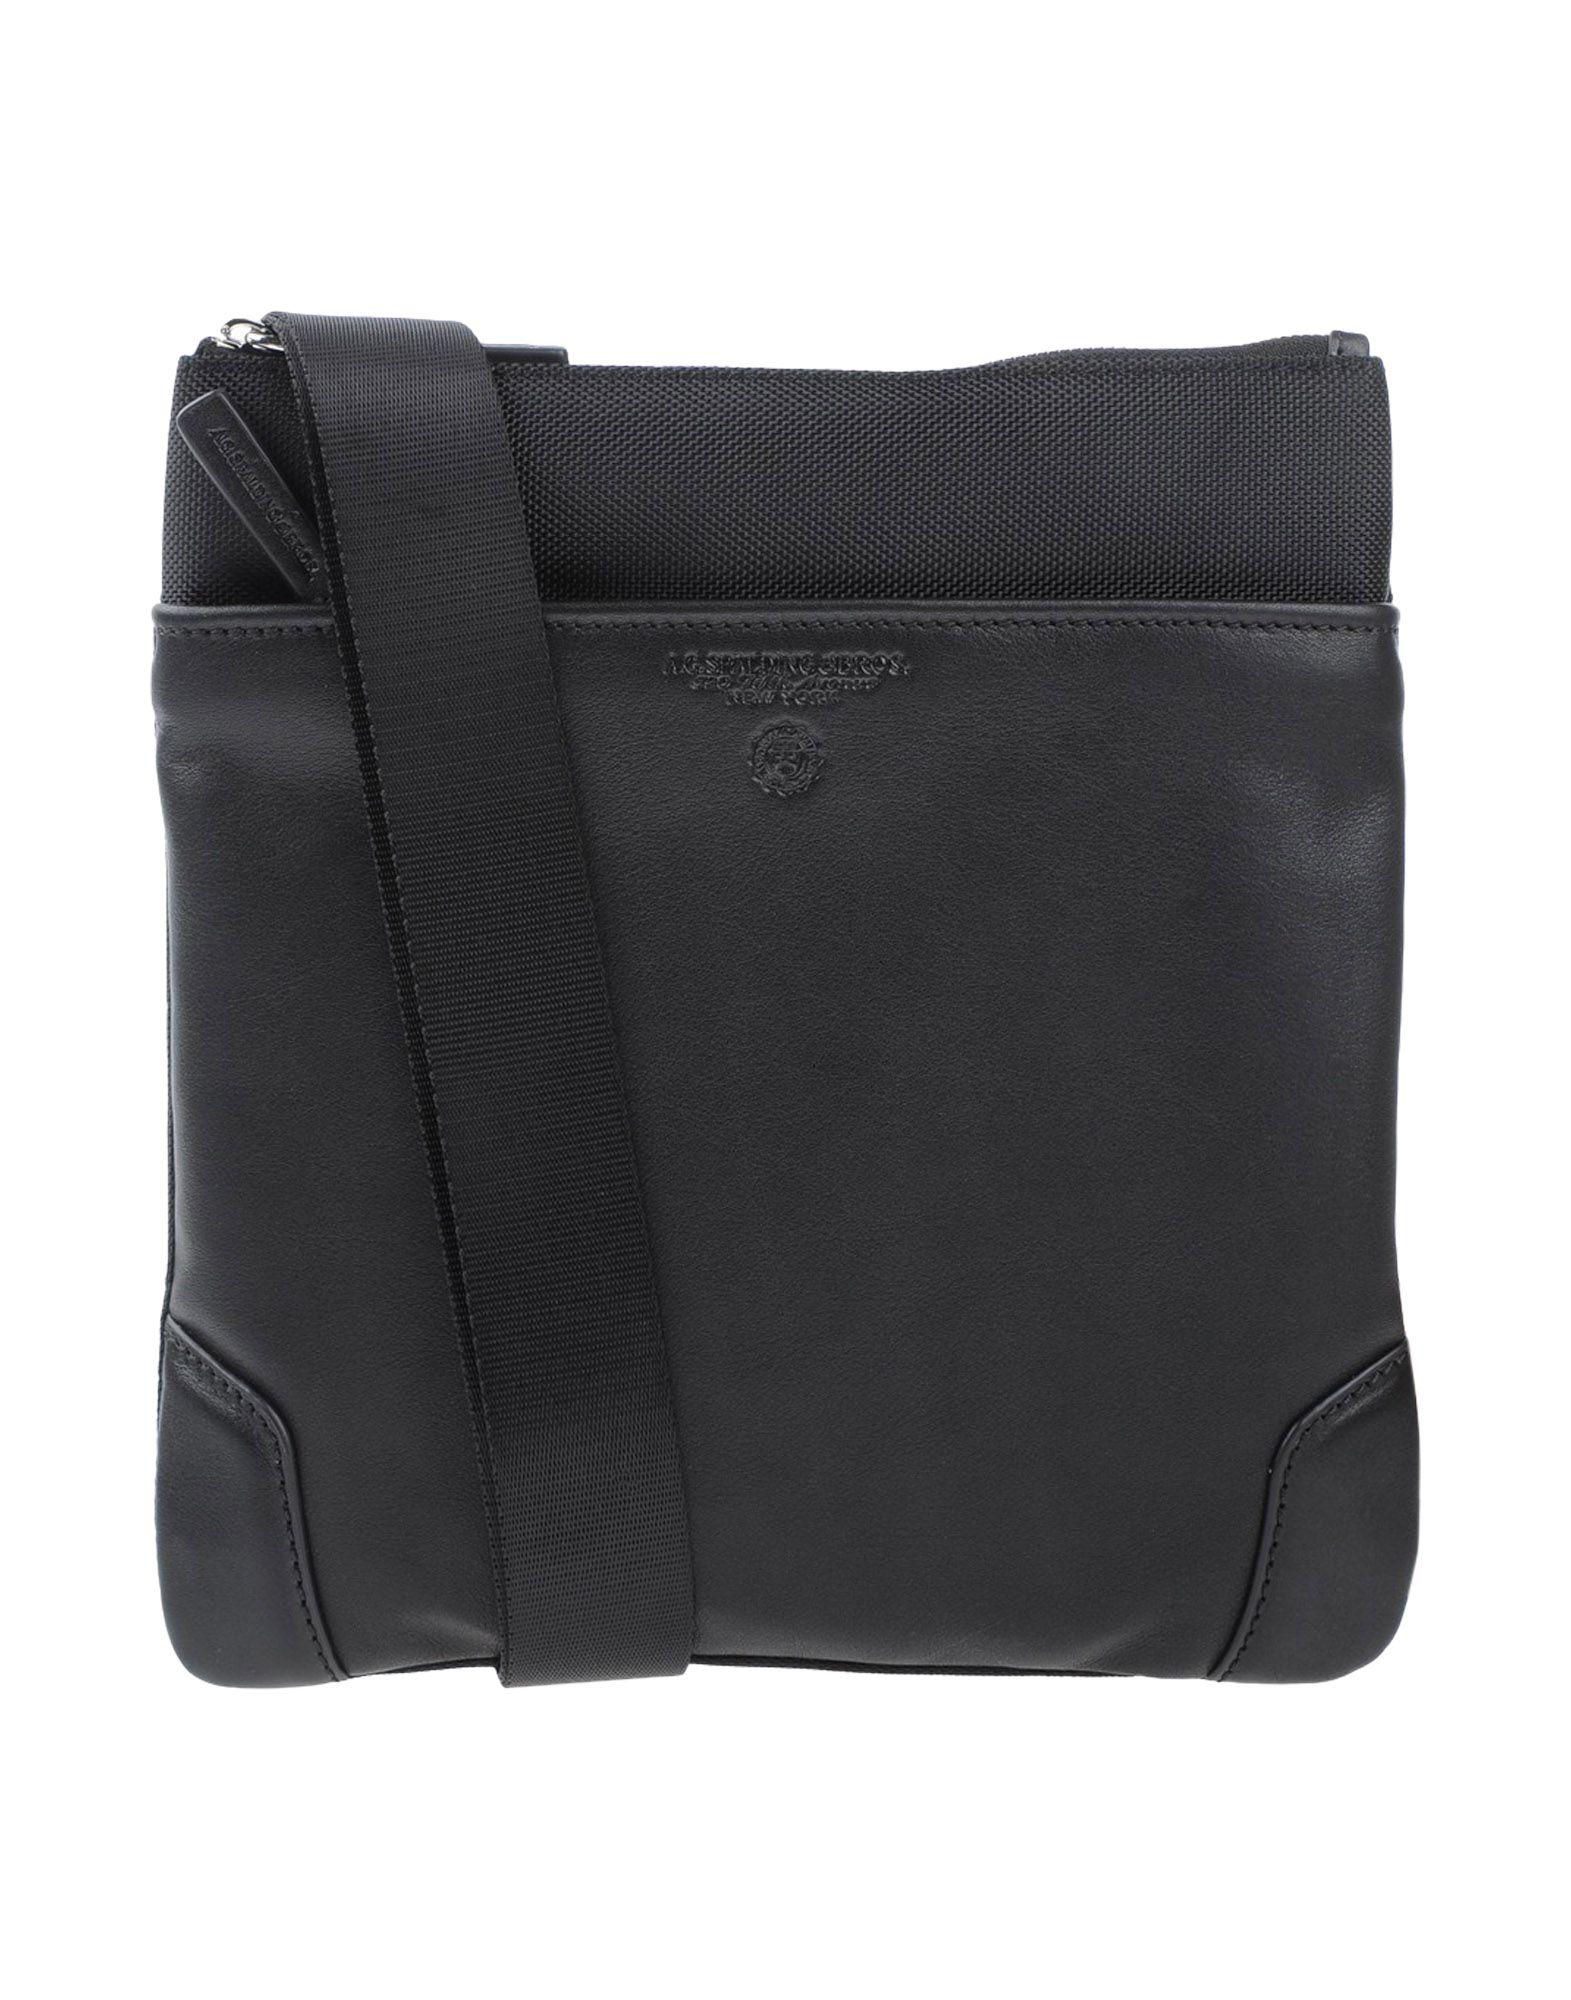 A.G. SPALDING & BROS. 520 FIFTH AVENUE  New York Сумка через плечо kate spade new york сумка на руку